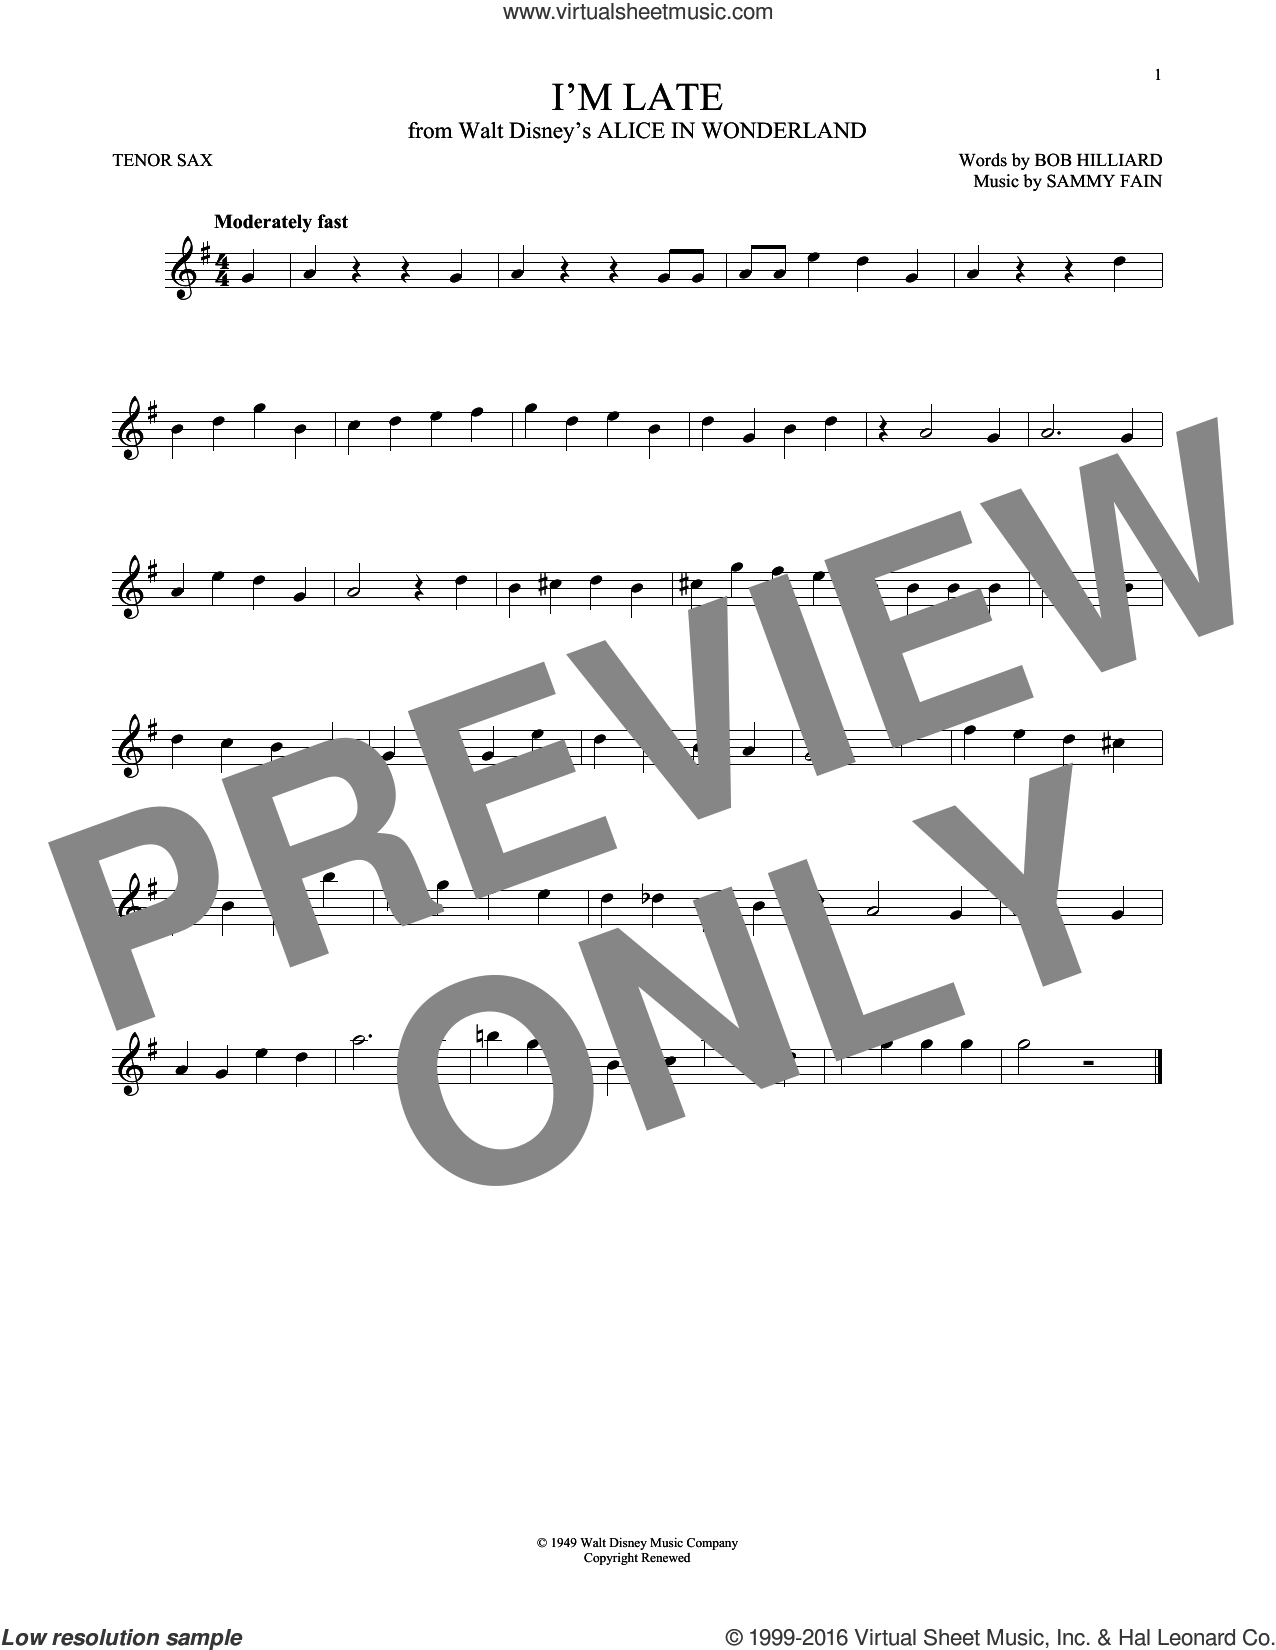 I'm Late sheet music for tenor saxophone solo by Sammy Fain and Bob Hilliard, intermediate skill level